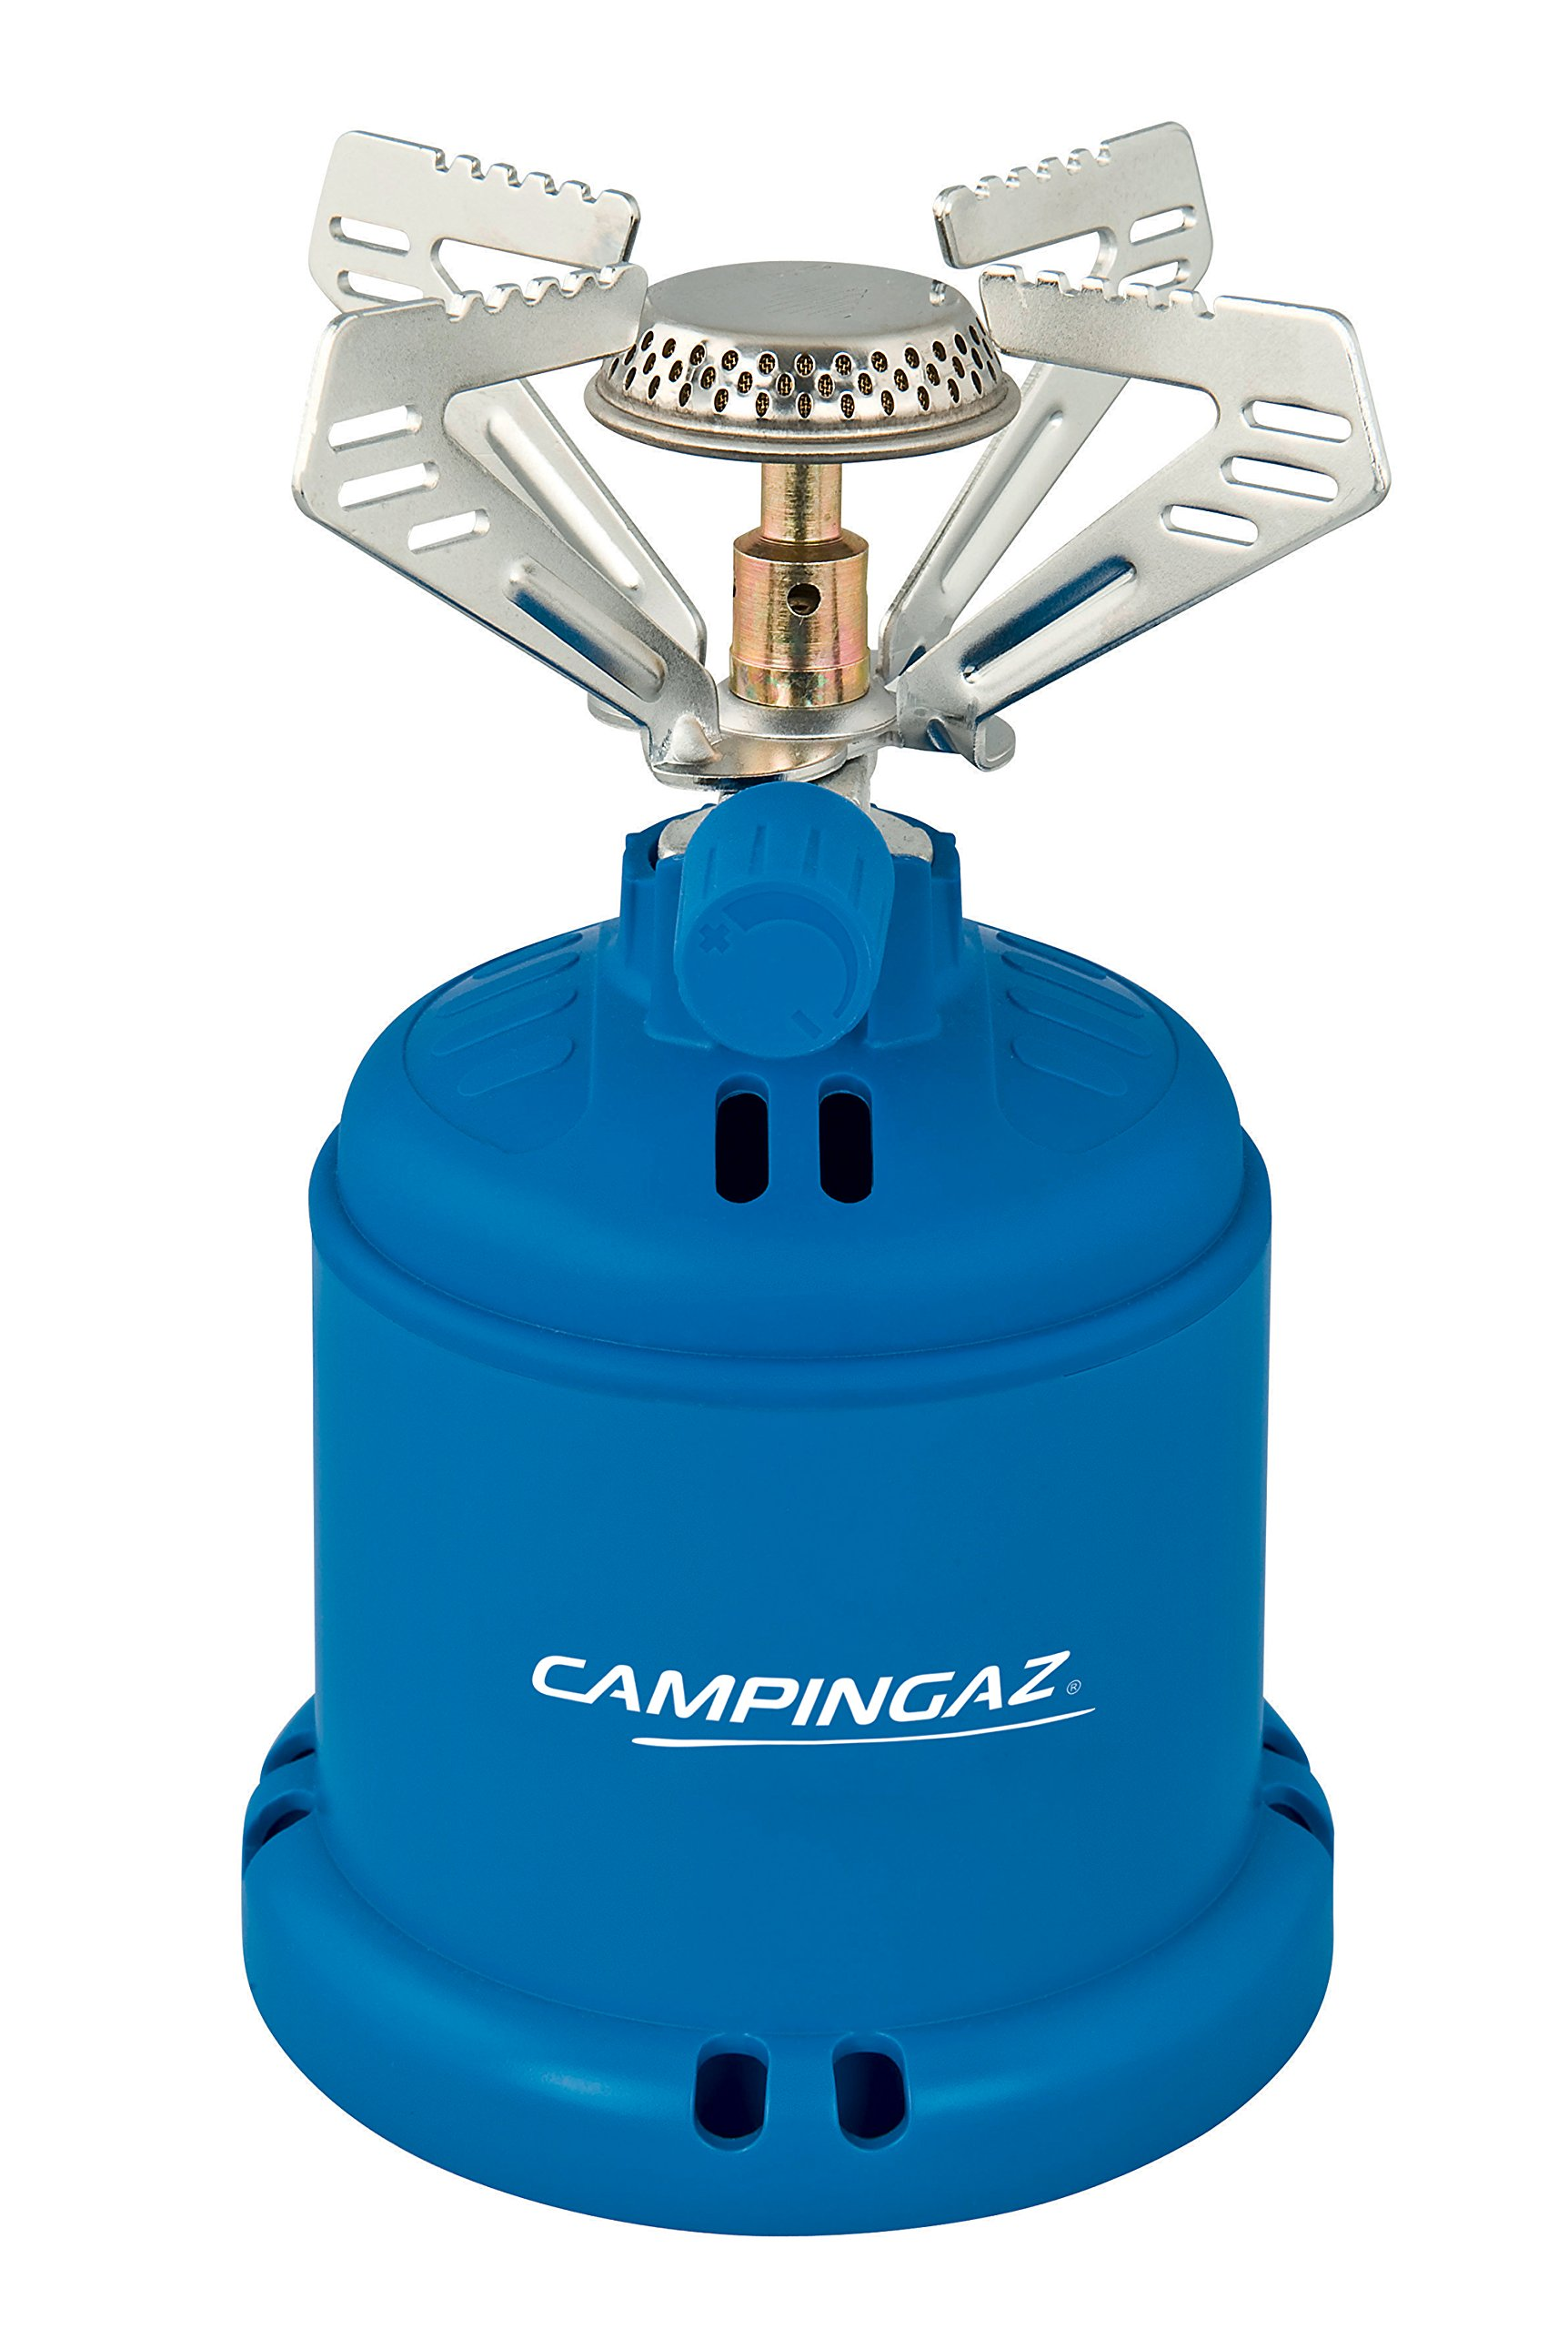 Campingaz Camping 206S Hornillo con Gas, Unisex, Azul product image